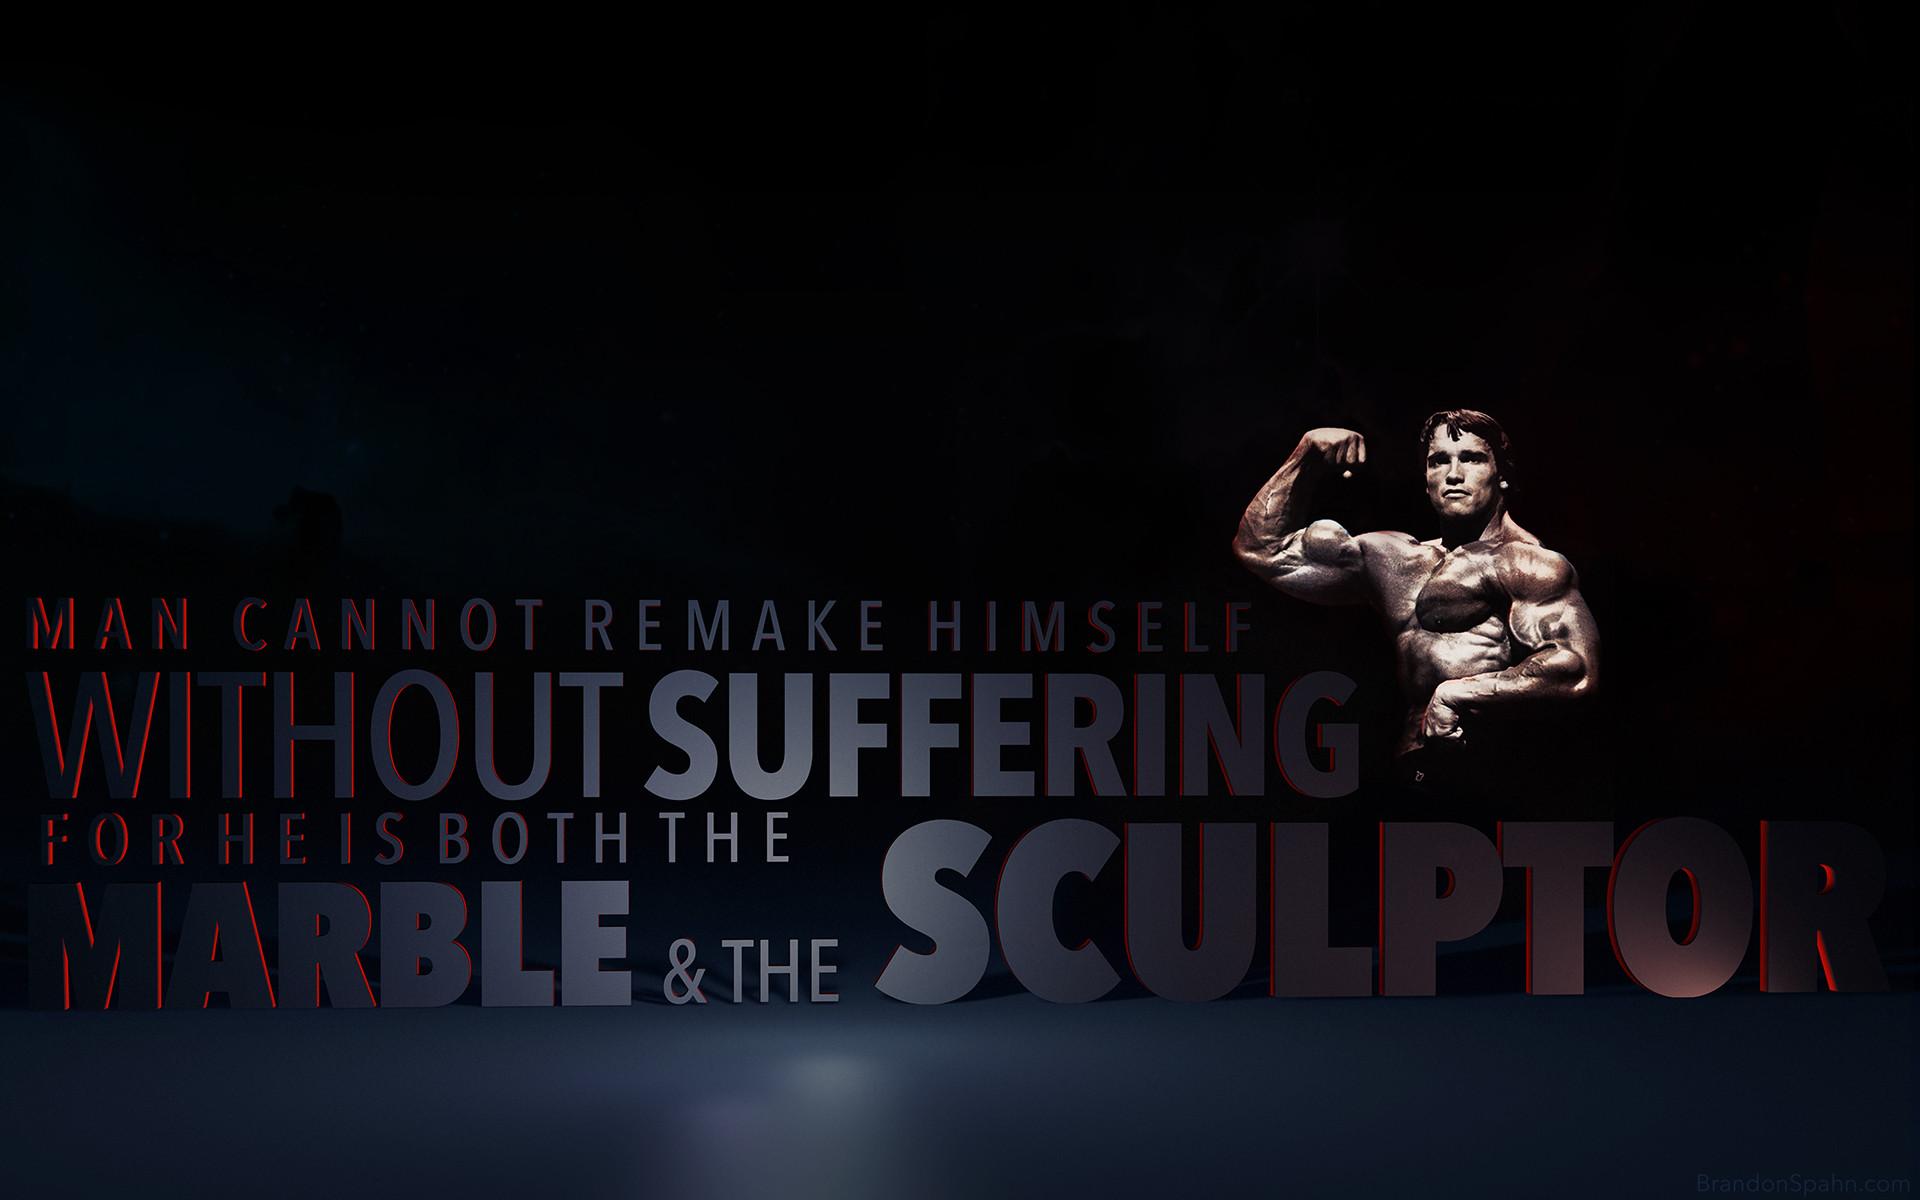 Arnold Motivational Wallpapers - WallpaperSafari